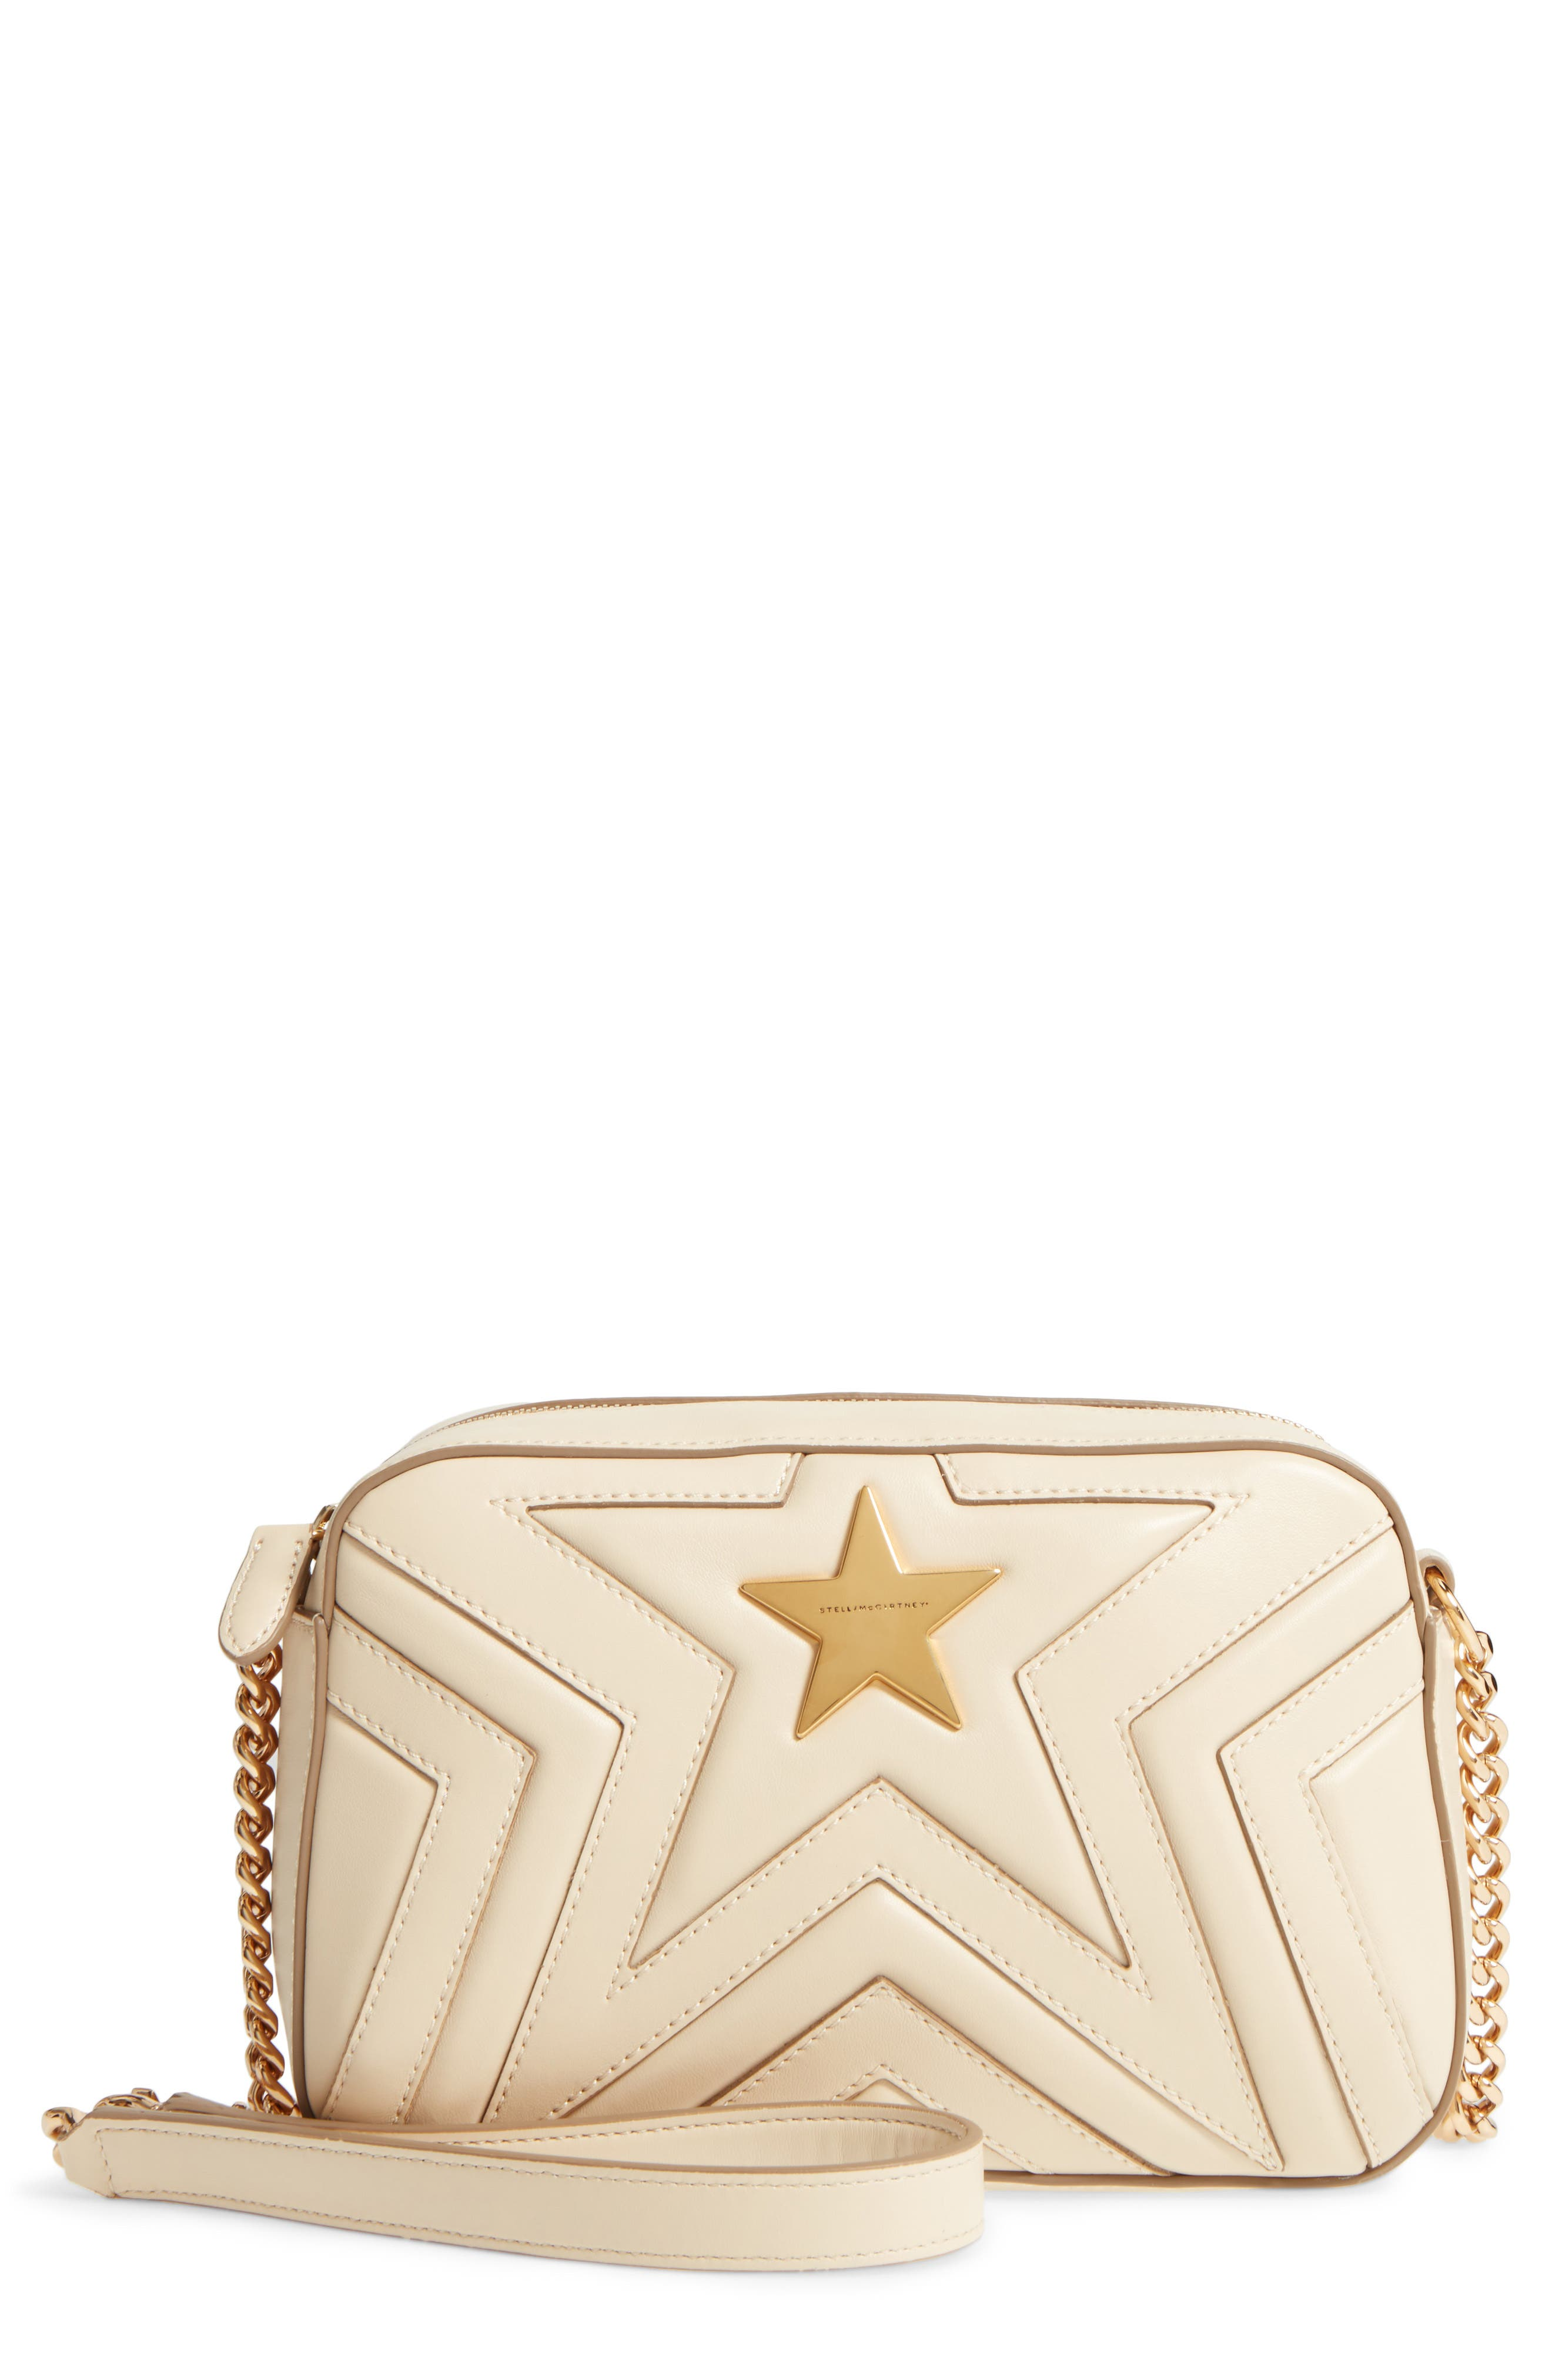 Alter Nappa Faux Leather Shoulder Bag,                             Main thumbnail 1, color,                             Cream